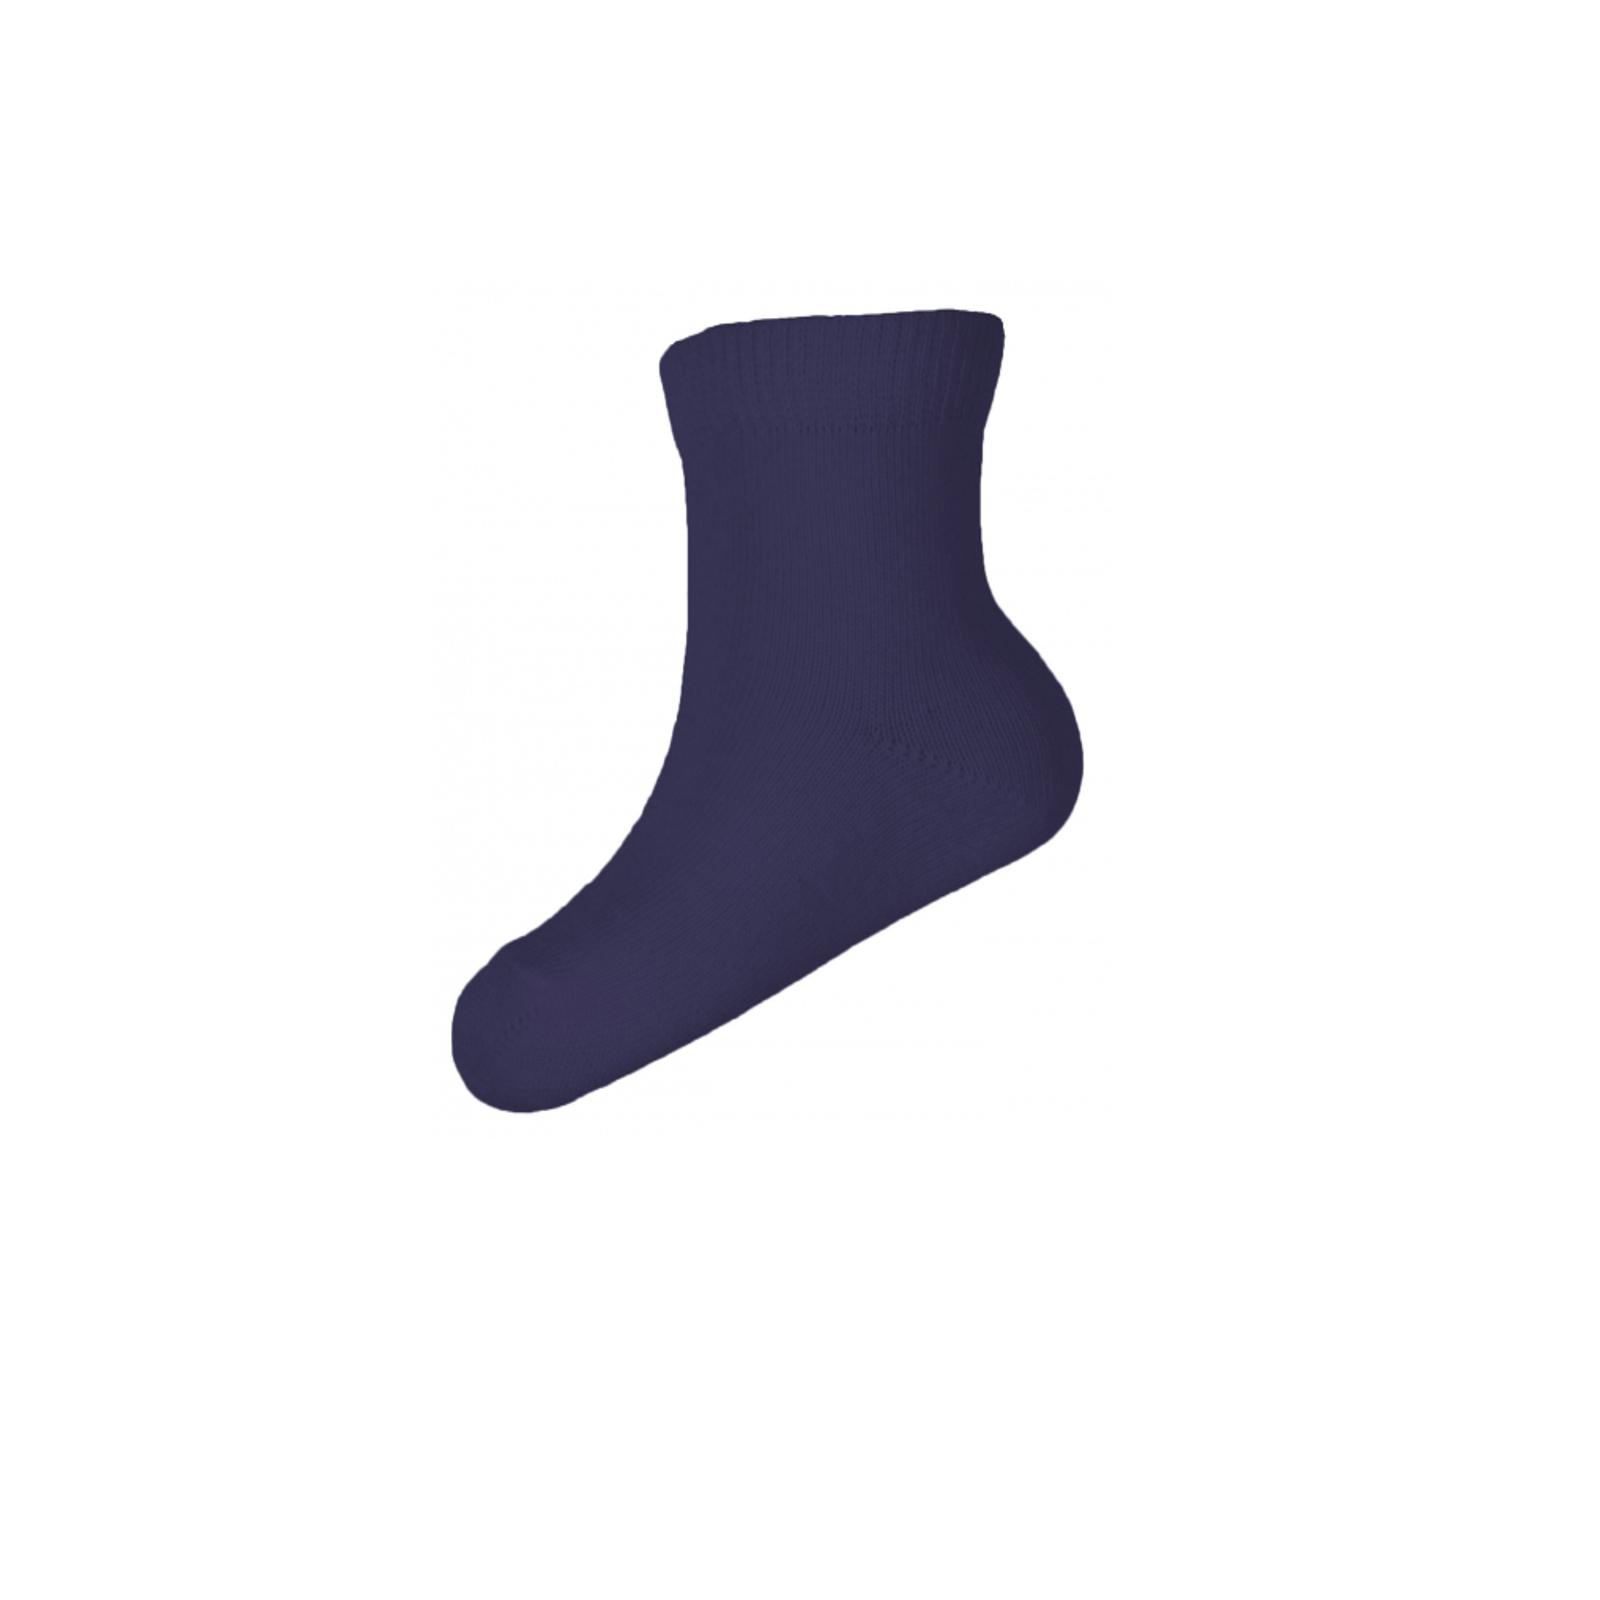 Носки Milusie модель 52 гладкие размер 11-12